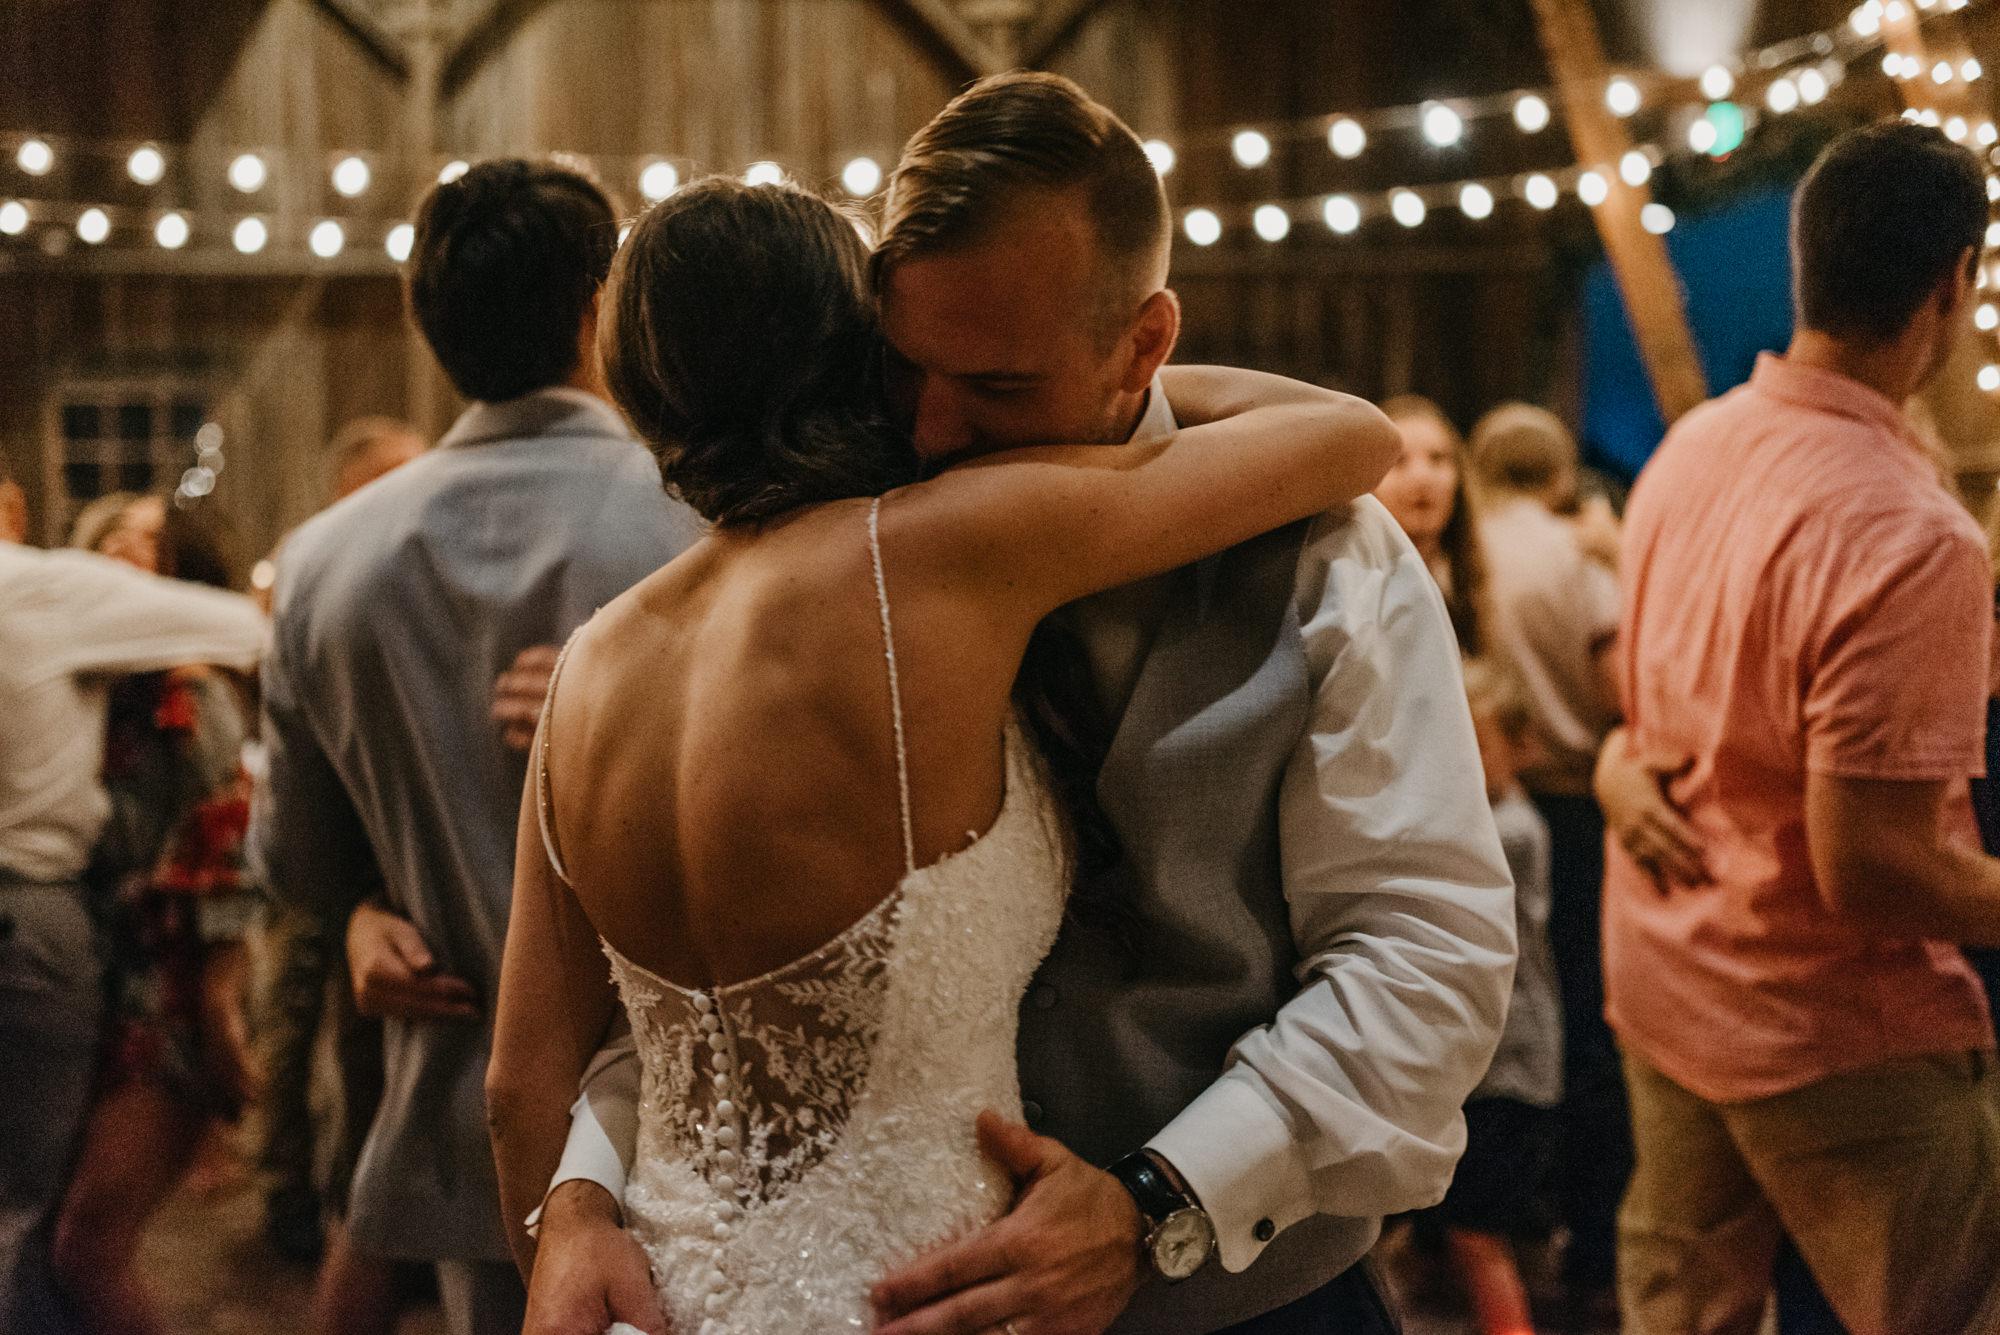 220-portland-northwest-wedding-bubble-exit-barn-string-lights.jpg